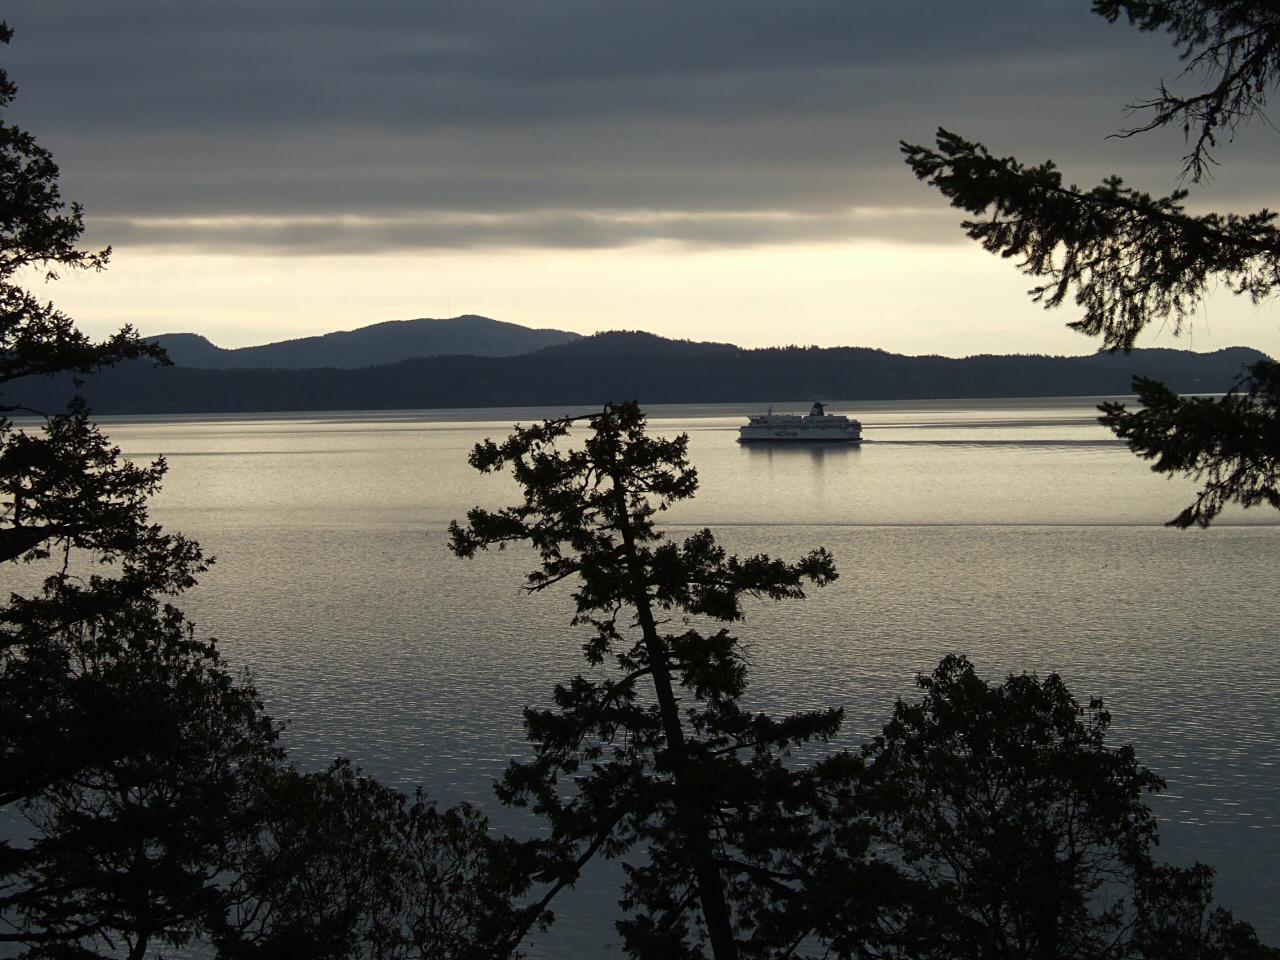 Morning ferry